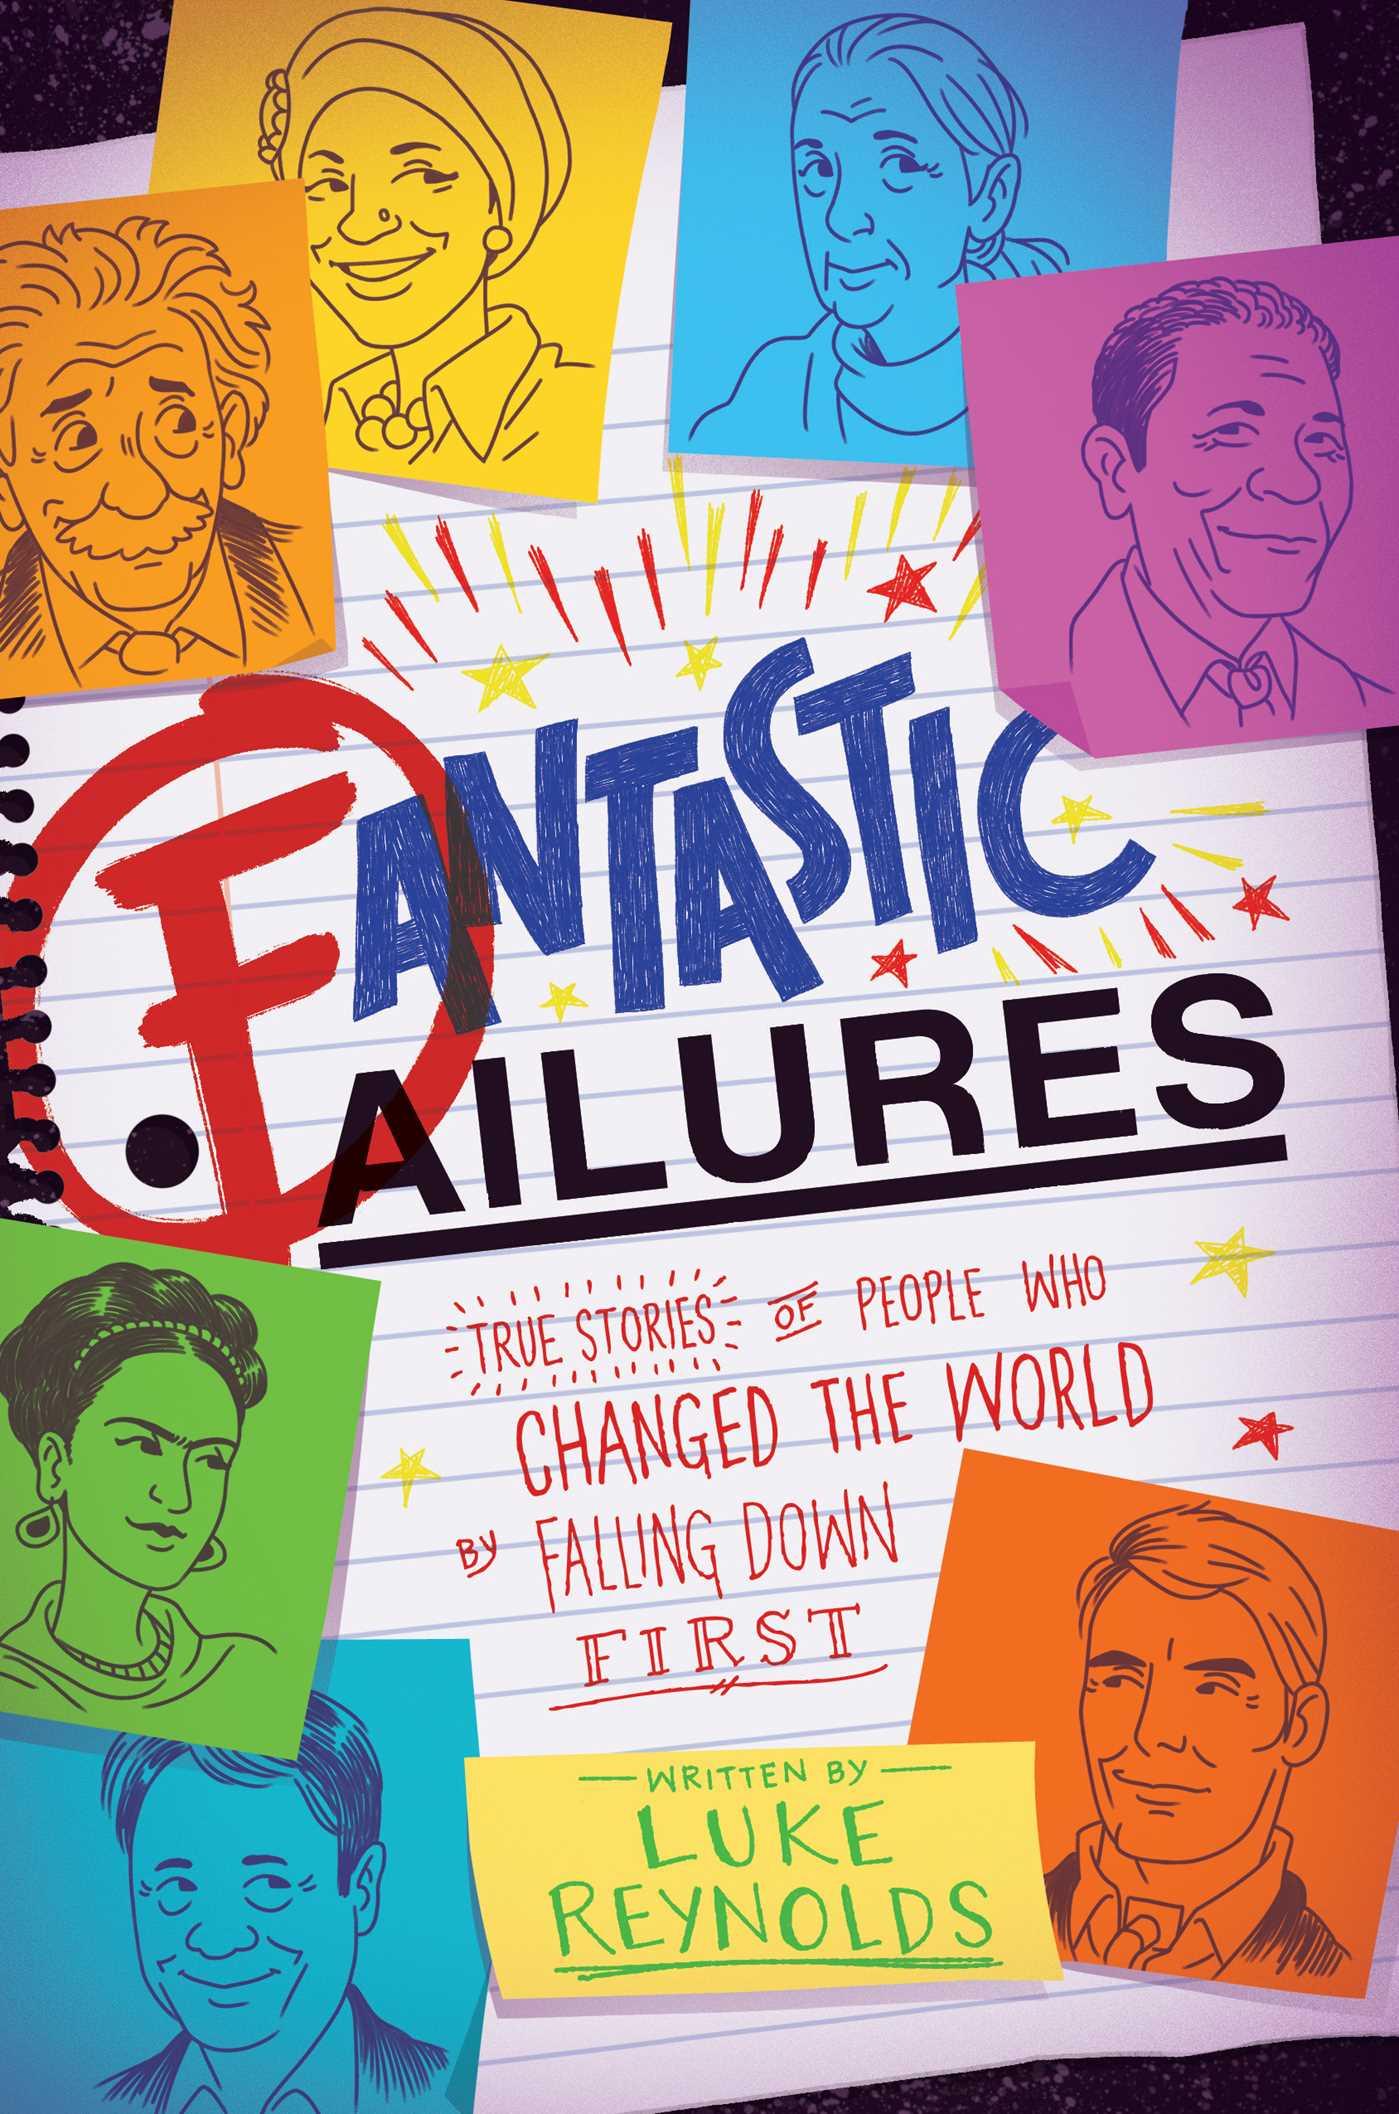 Fantastic failures 9781582706658 hr